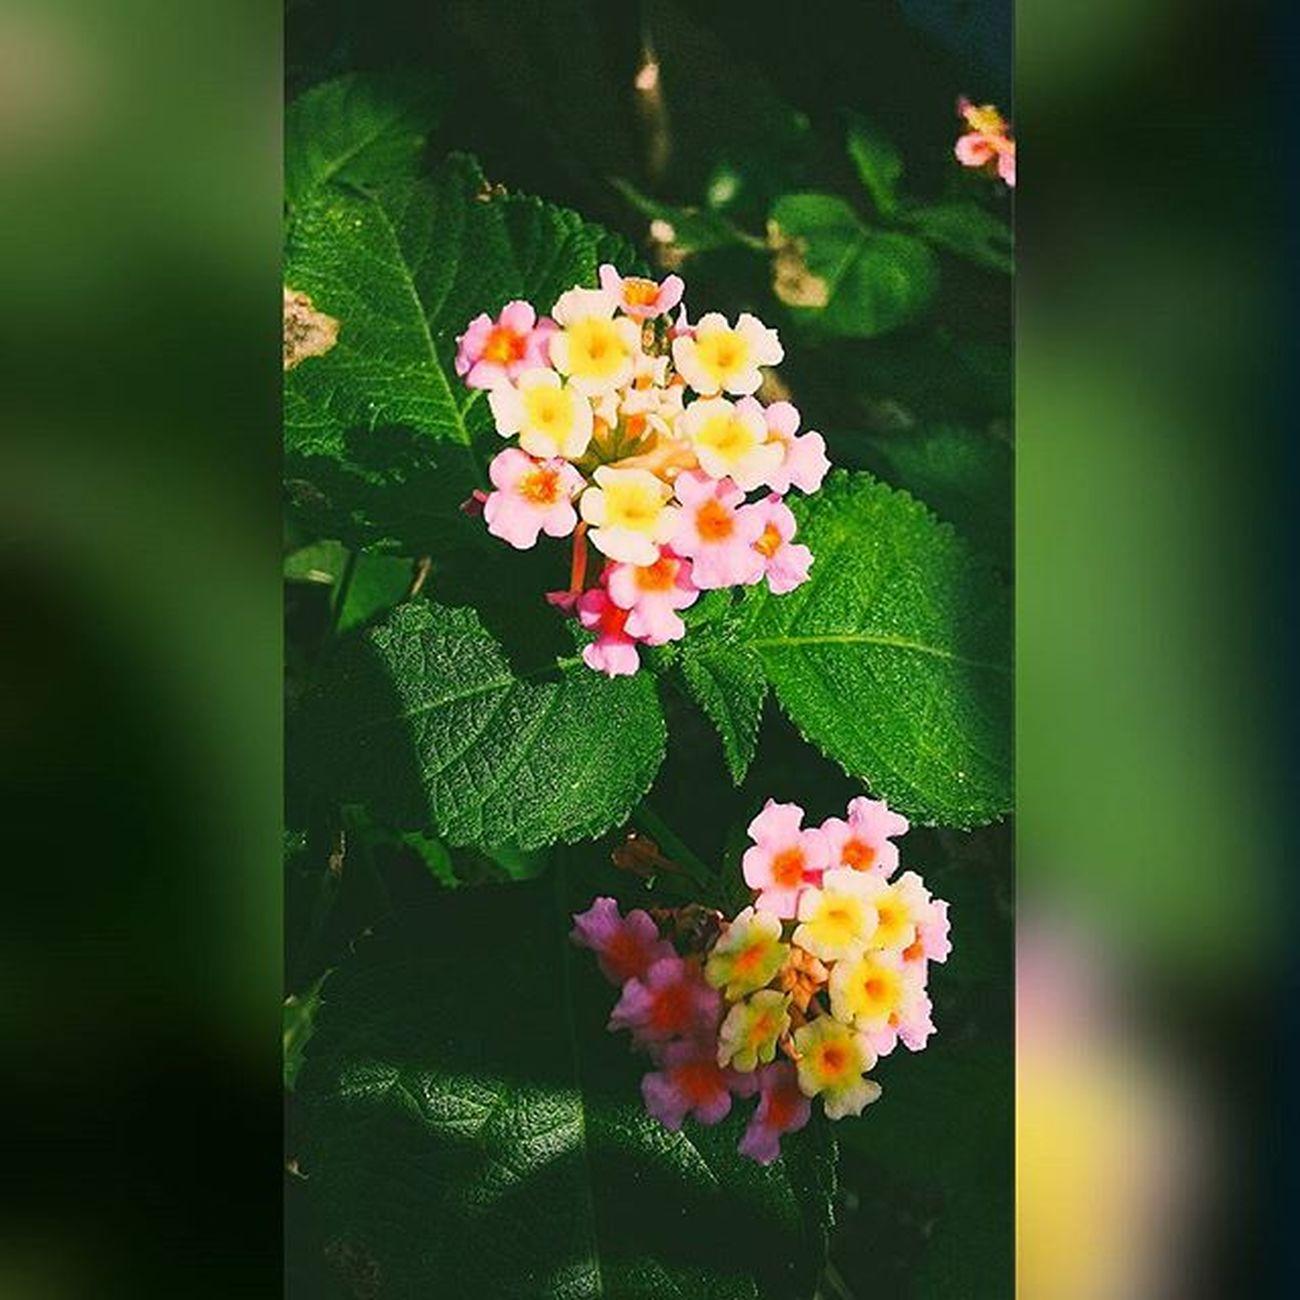 Vnmaphotography 📷 Flowers 🌸 Nature 🍃 Instasize 👣